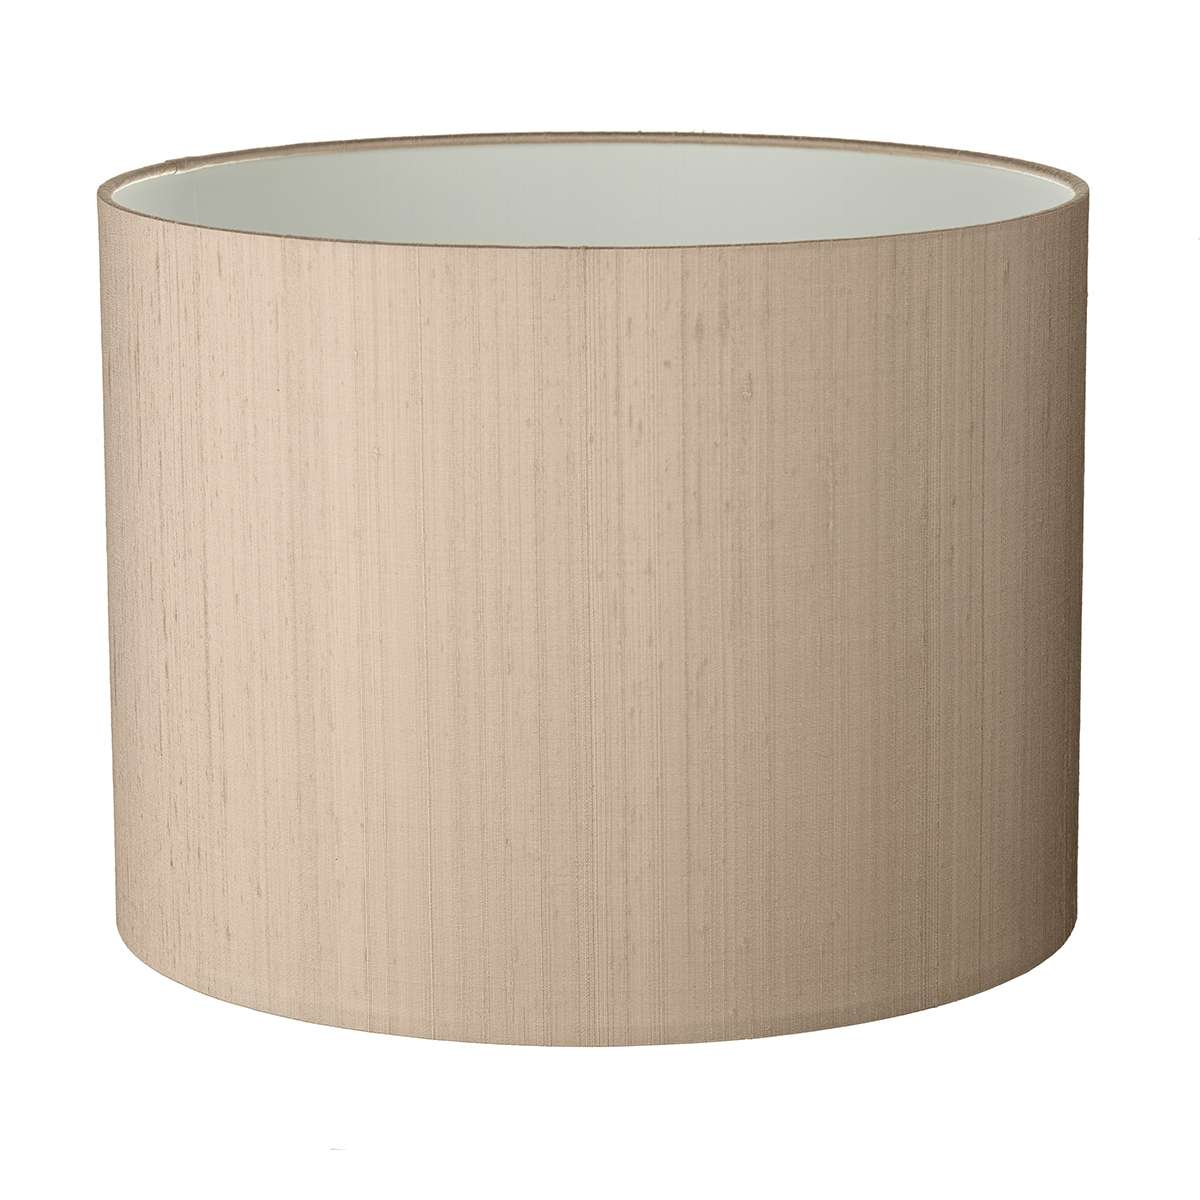 Drum Medium 50CM 100% Silk Shade with Shade Colour Options